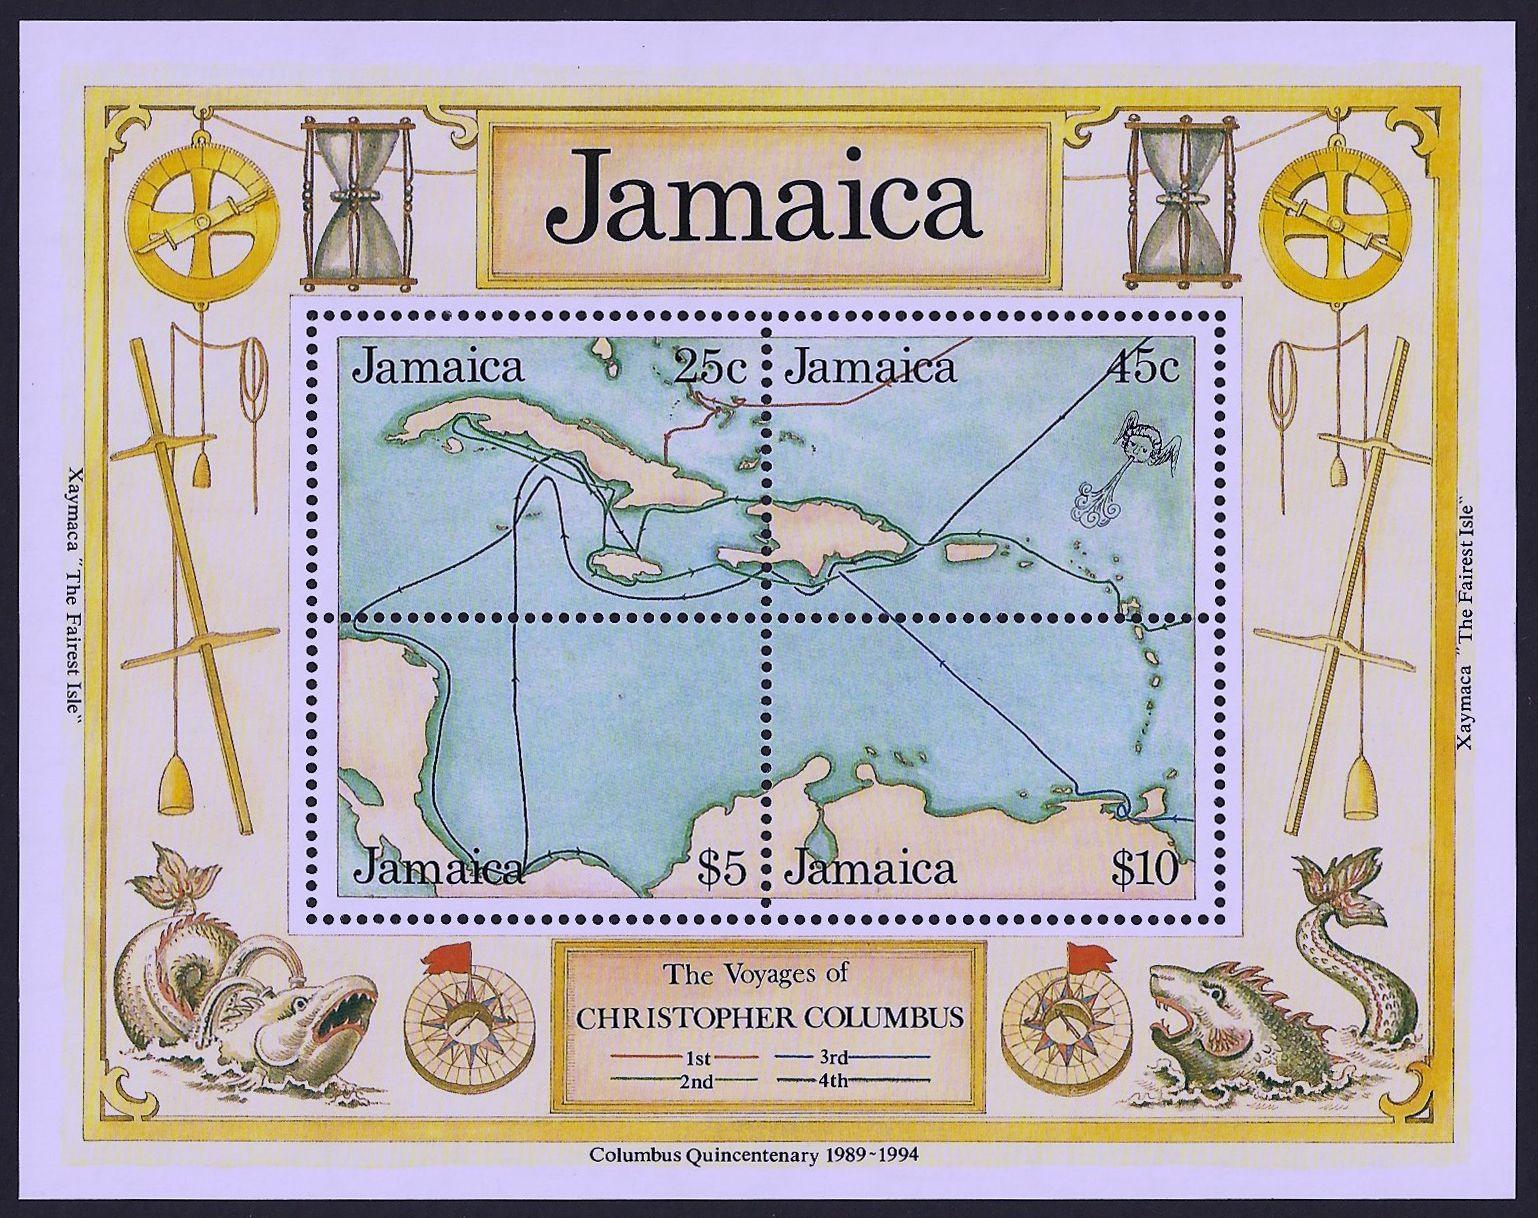 Jamaica Scott 745 19 Dec Small Souvenir Sheet